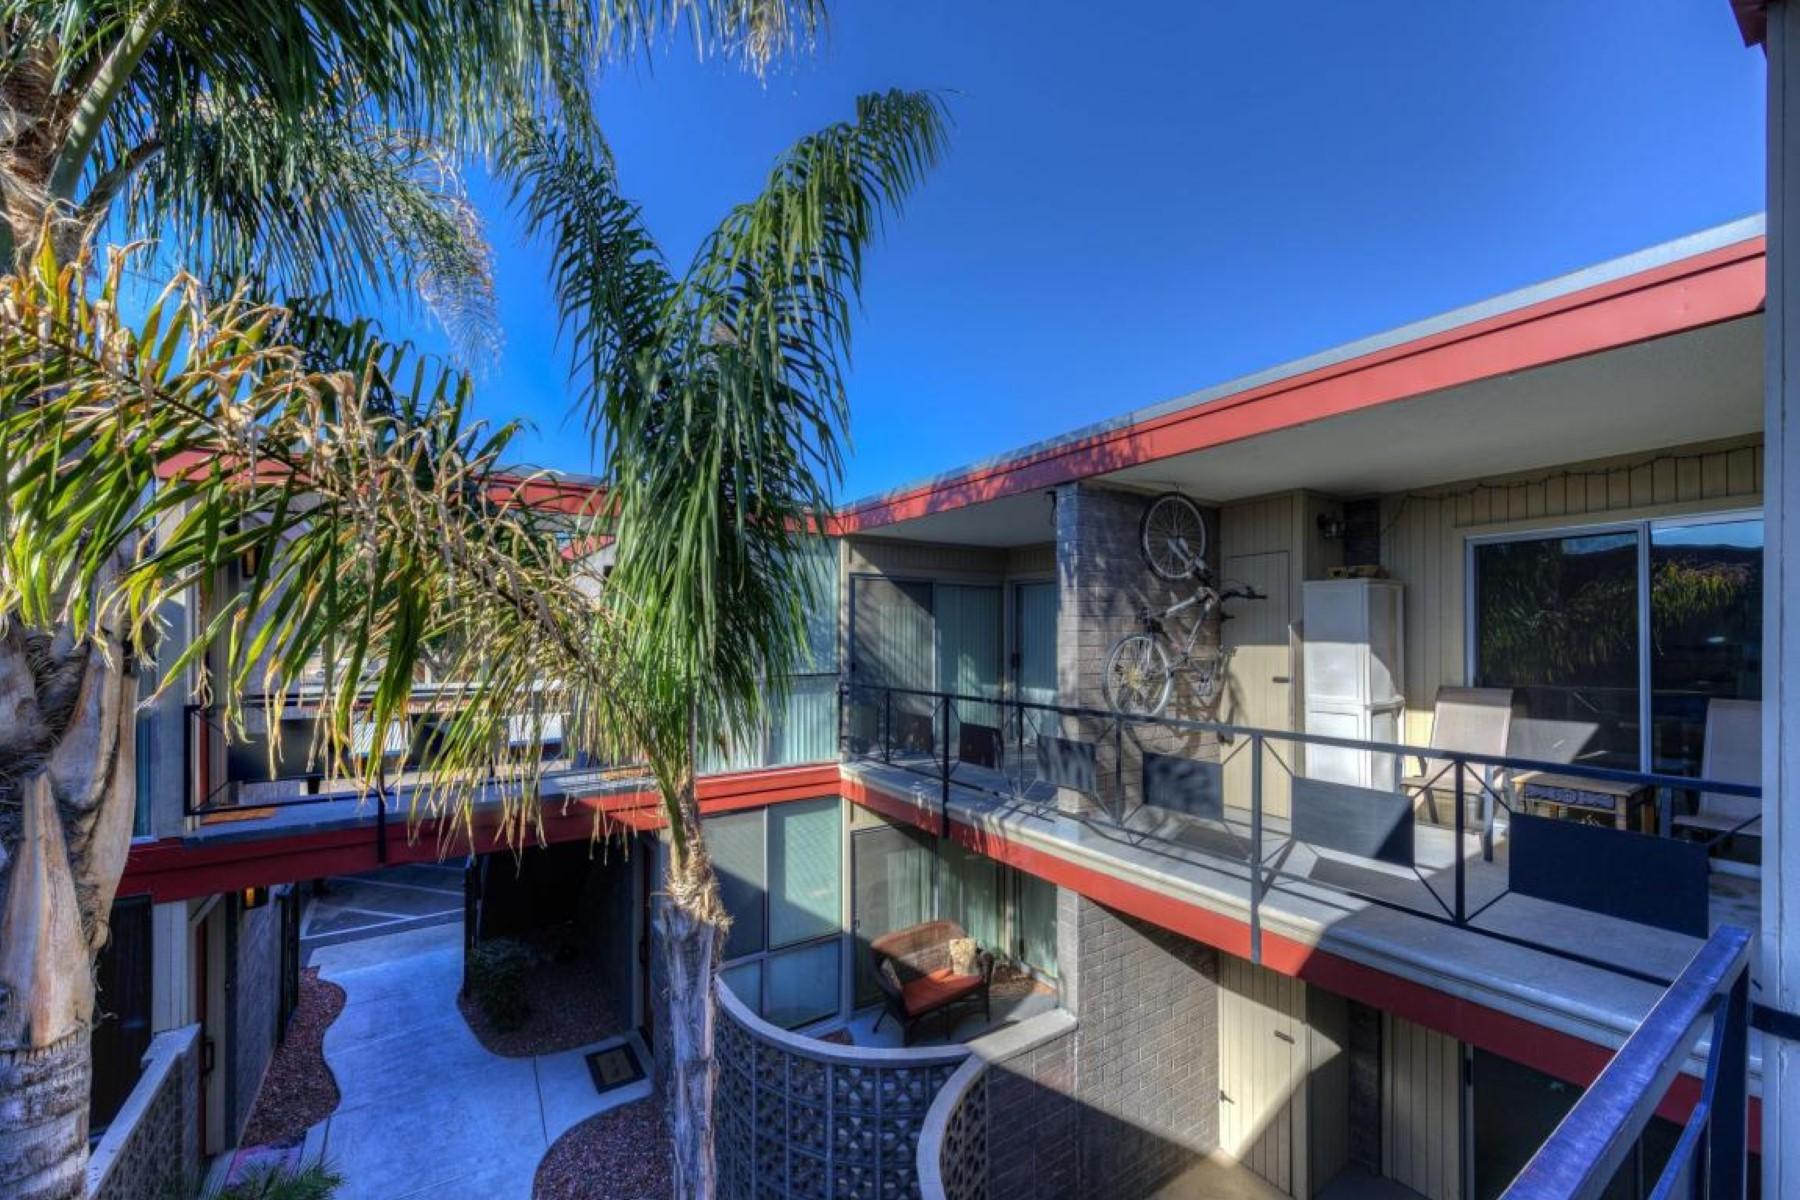 Apartment for Sale at Experience boutique living in this mid-century modern luxury condominium 1225 E Medlock Dr #202 Phoenix, Arizona, 85014 United States